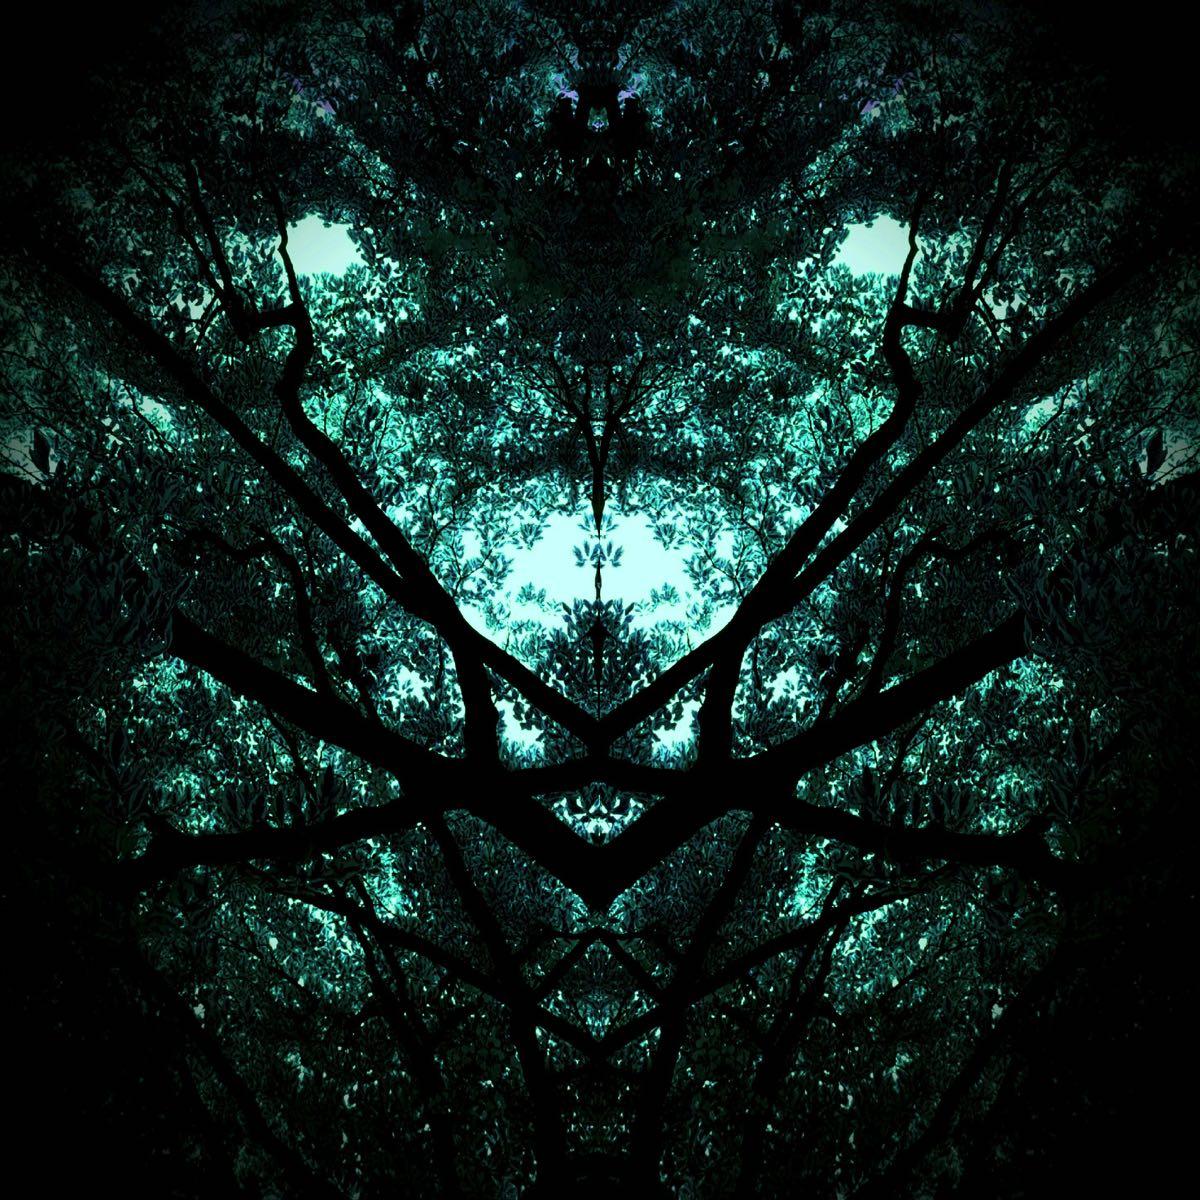 Subconscious - Tree Creatures #3 (40x40 cm) - Print on cotton paper 2020